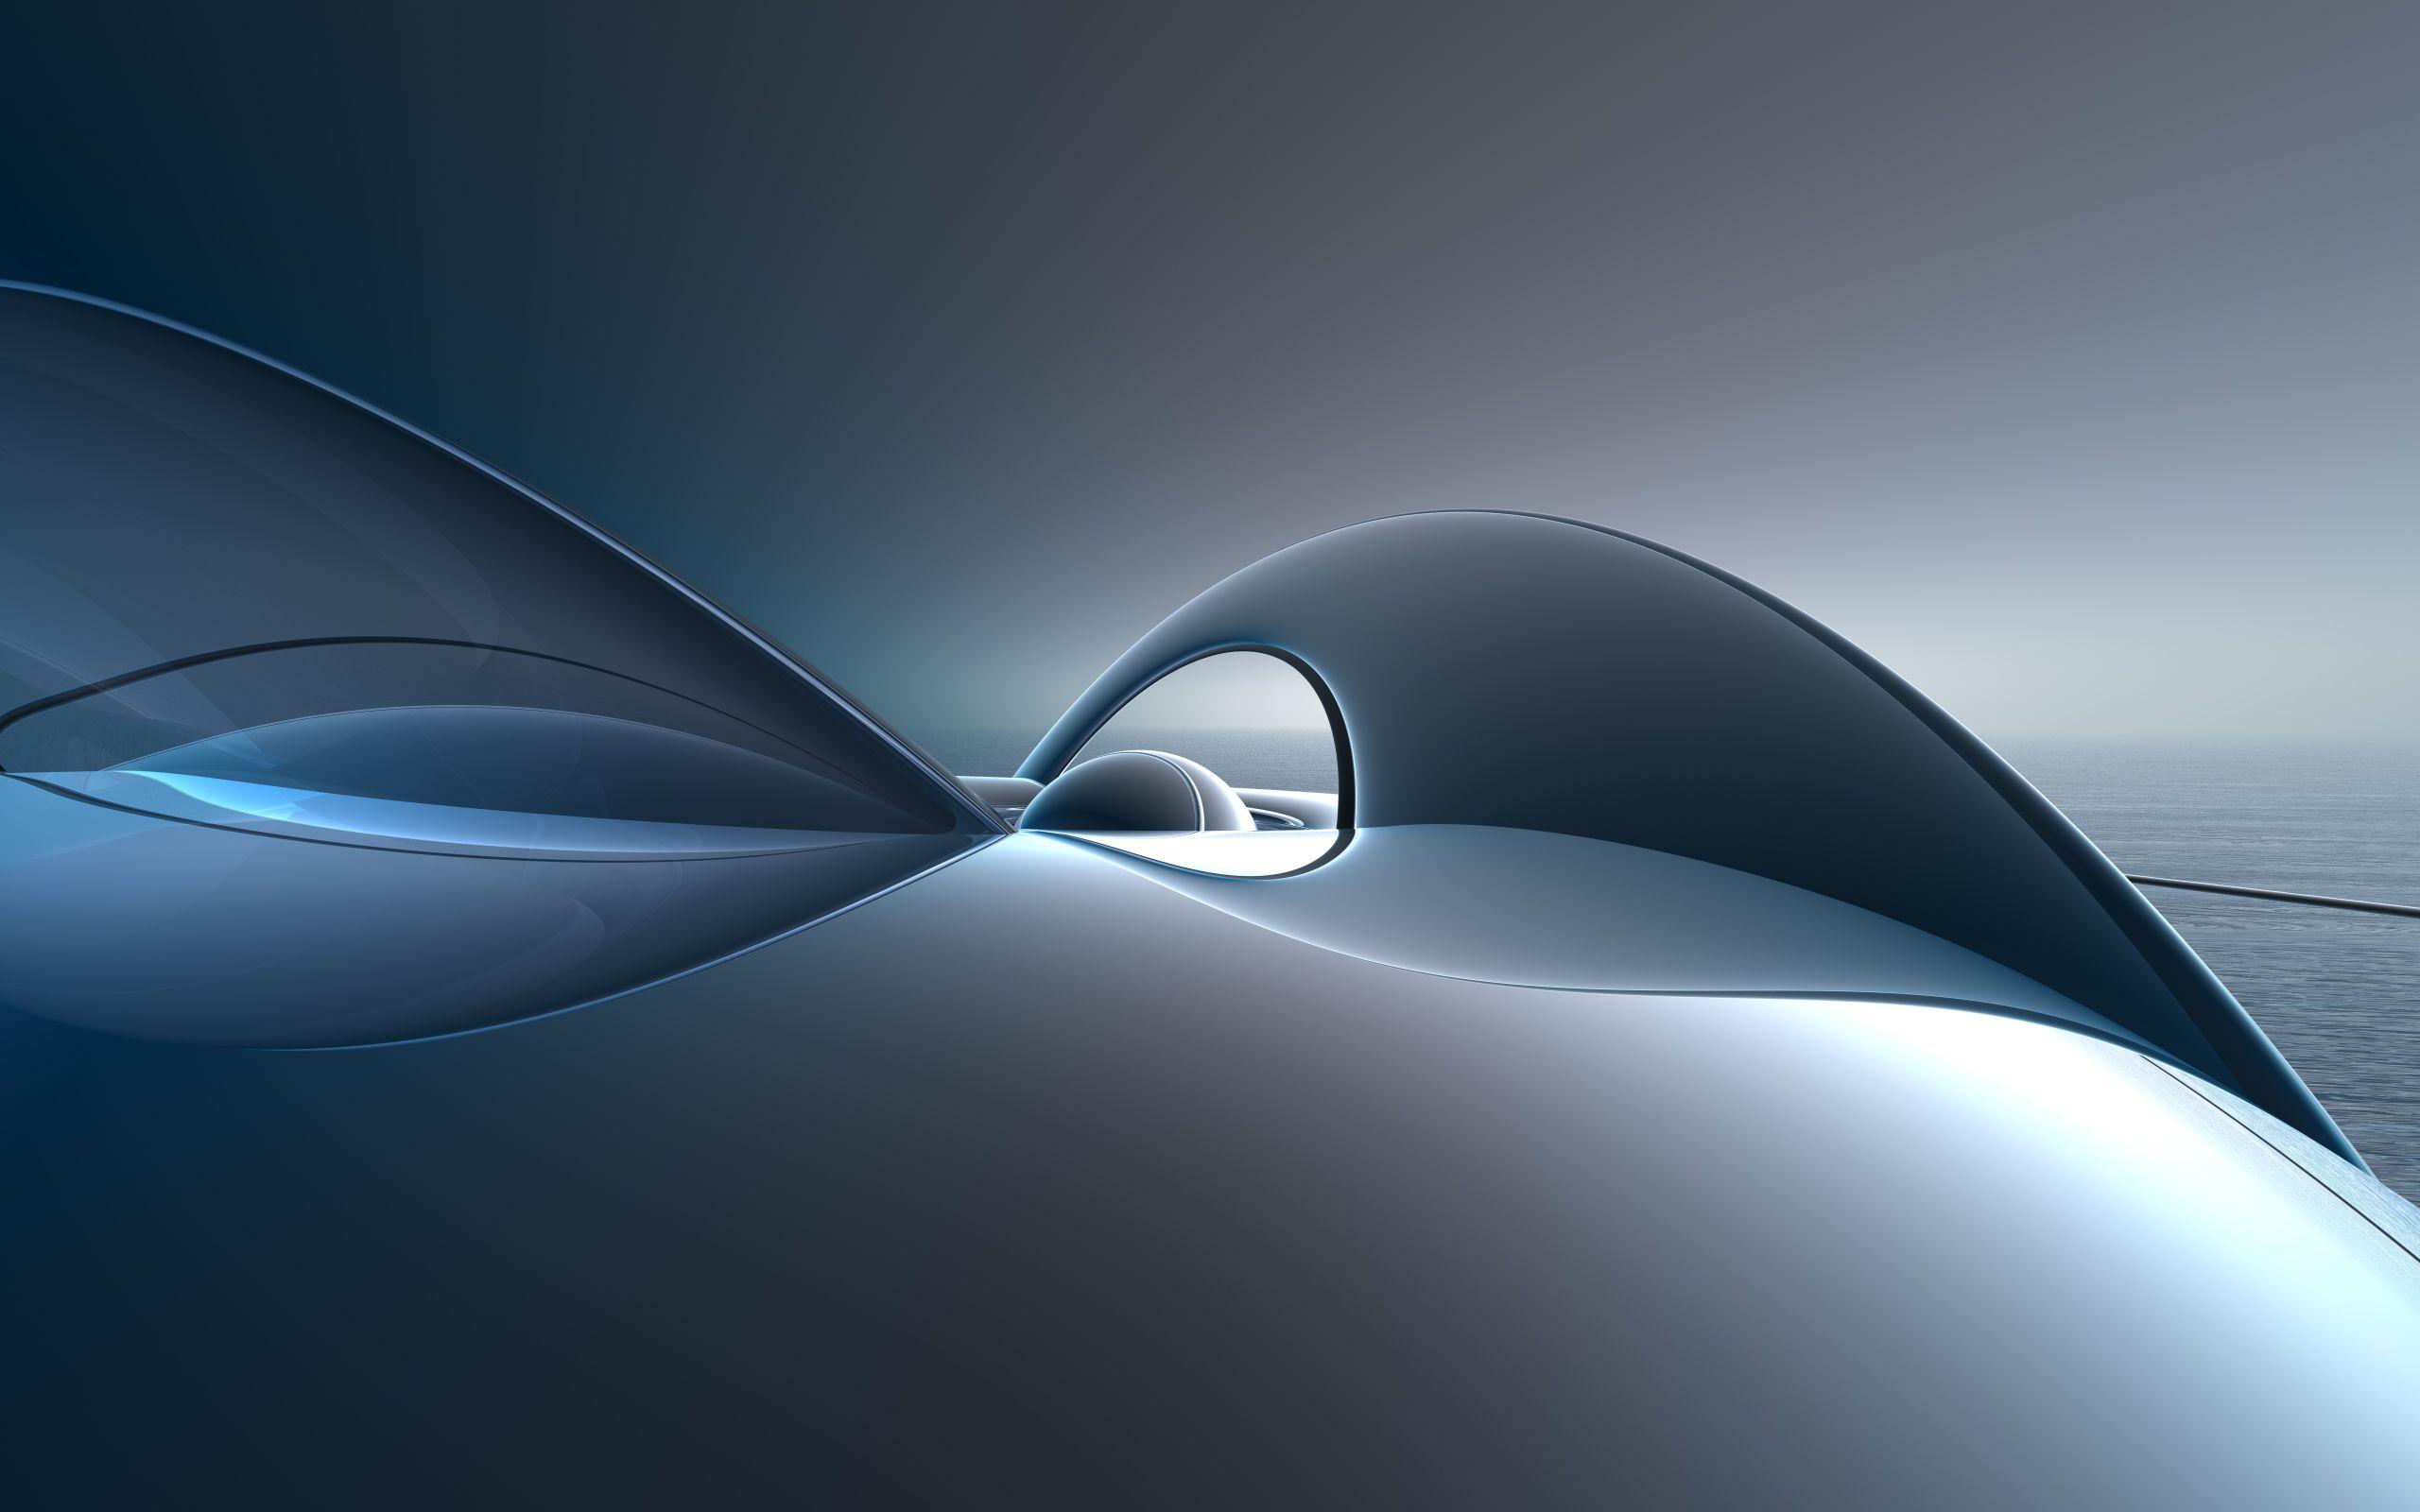 Must see Wallpaper High Resolution Blue - 226a1cc9bdc5d82f2e0c2866b4902296  Pic_946853.jpg